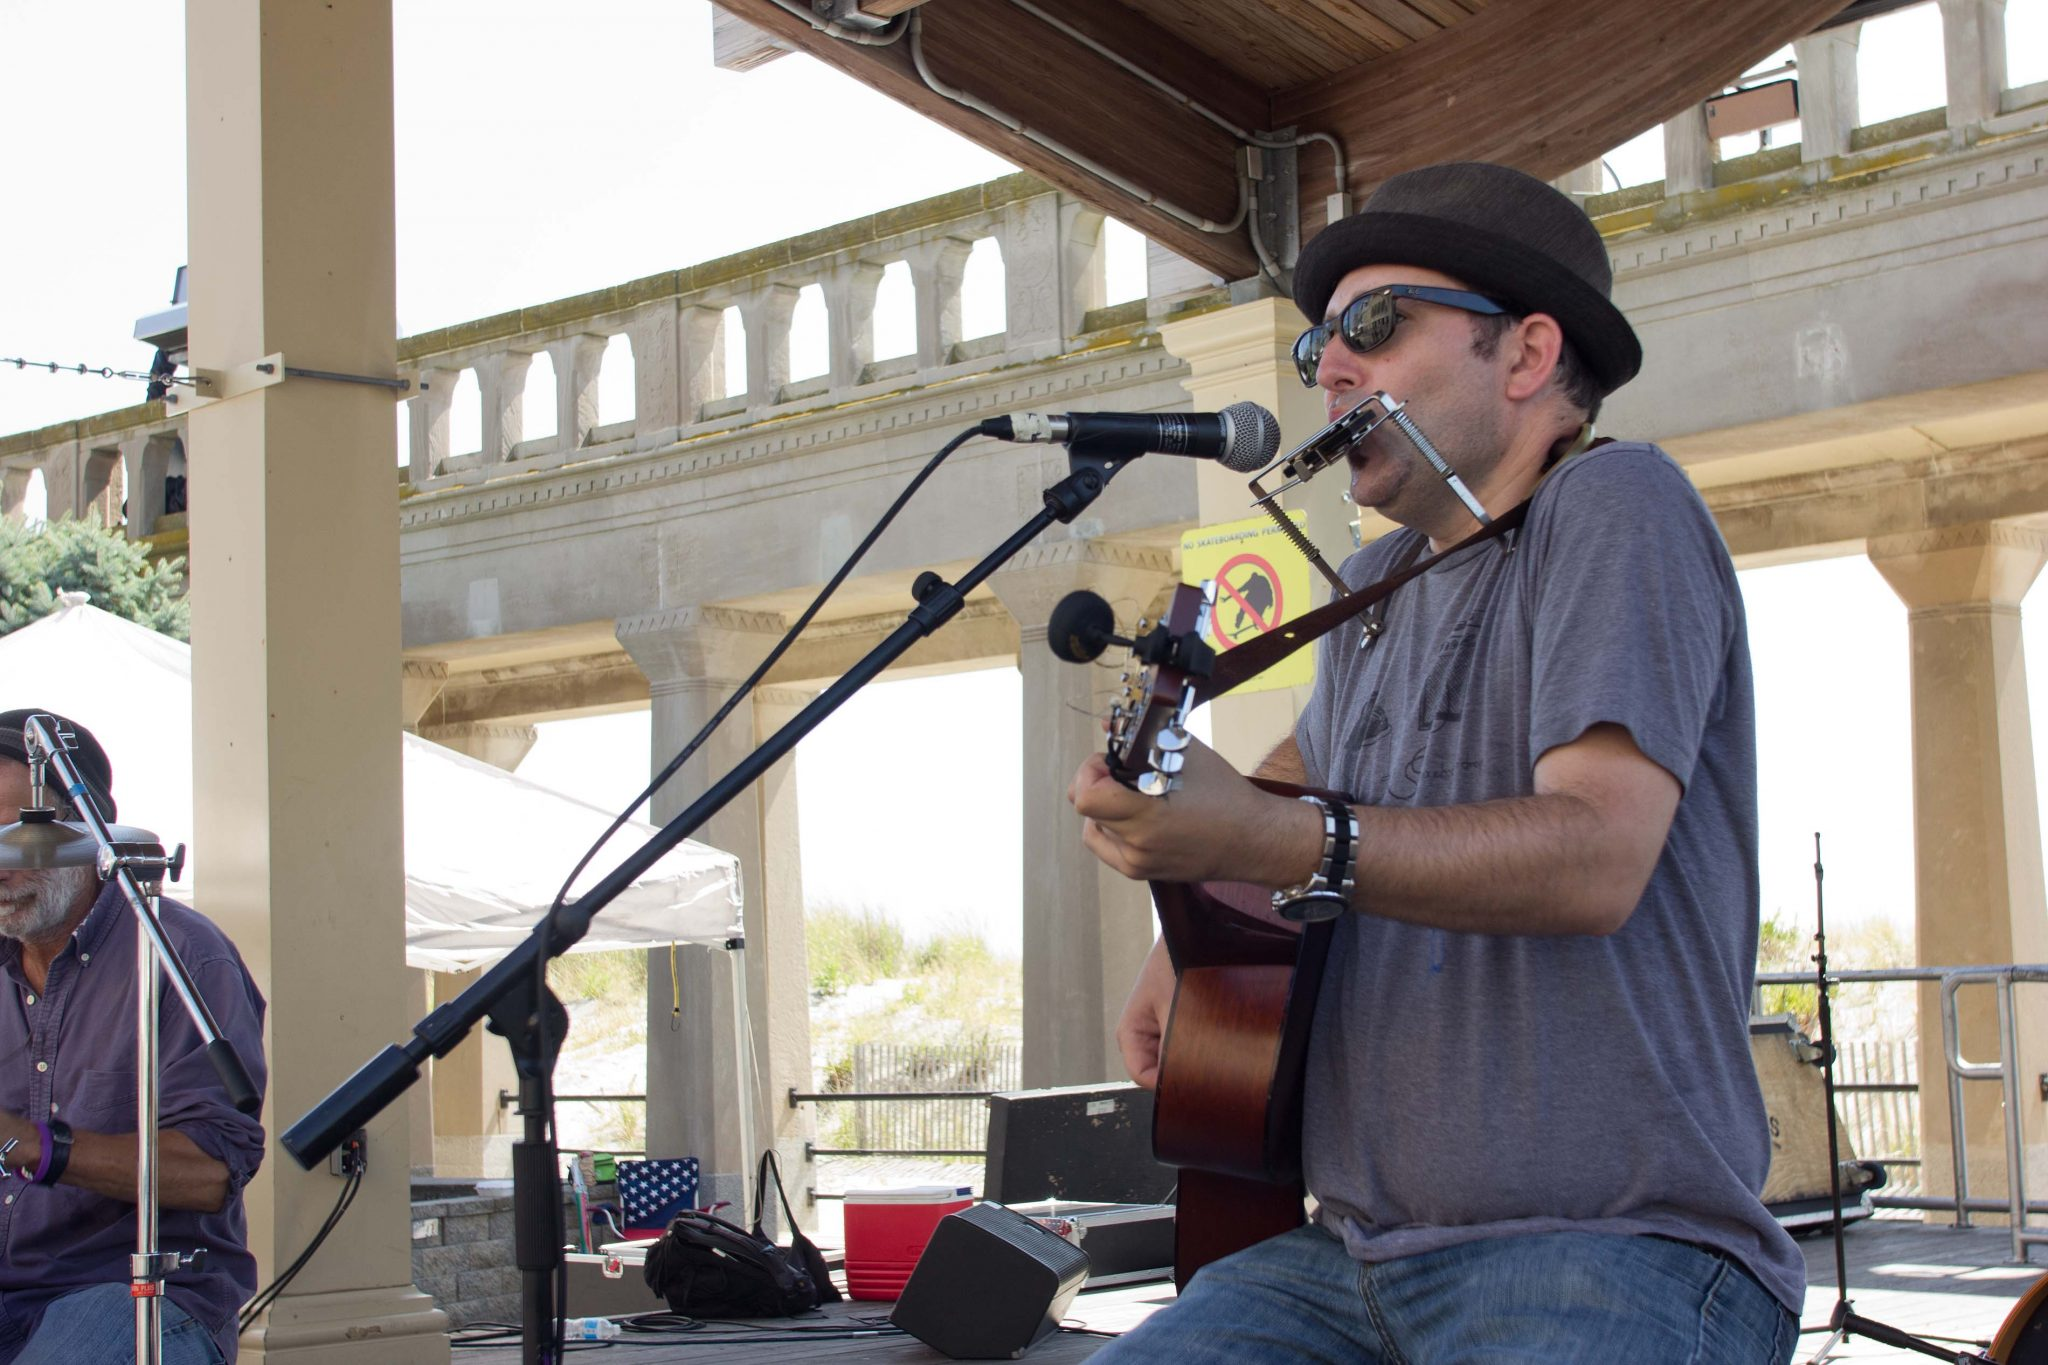 2015 Atlantic City Boardwalk Art Show - Musician Jeff Schwachter at Kennedy Plaza